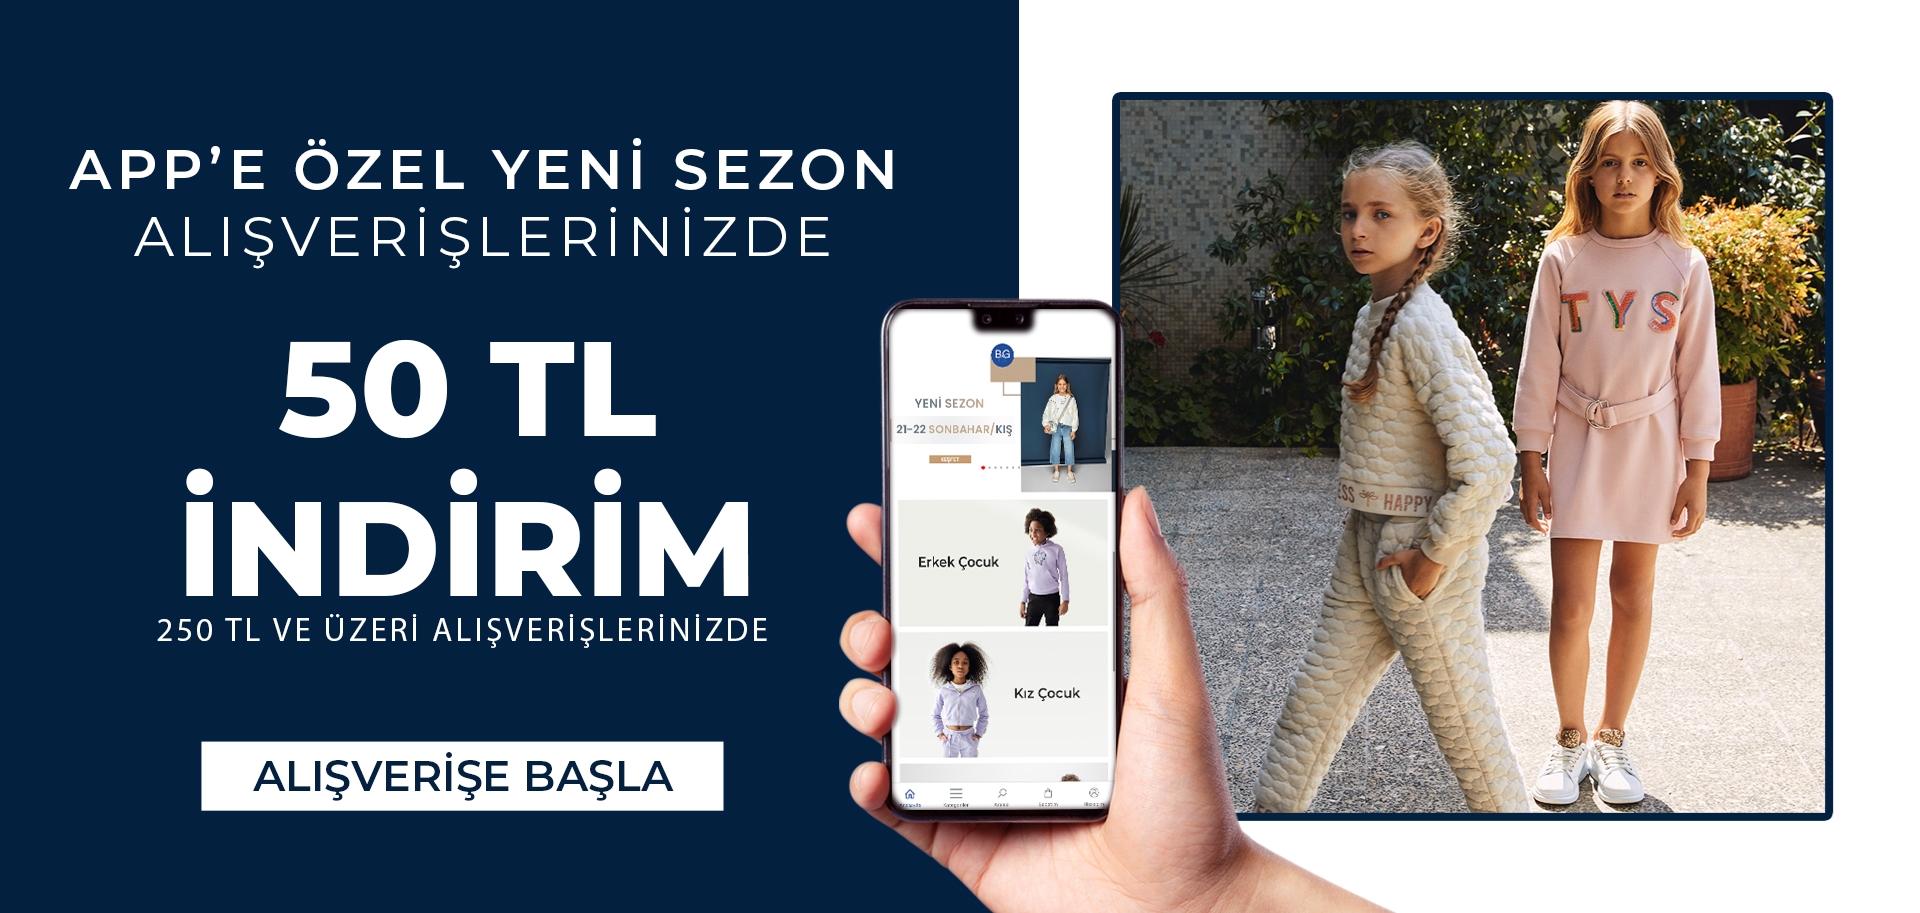 App Özel 50 TL